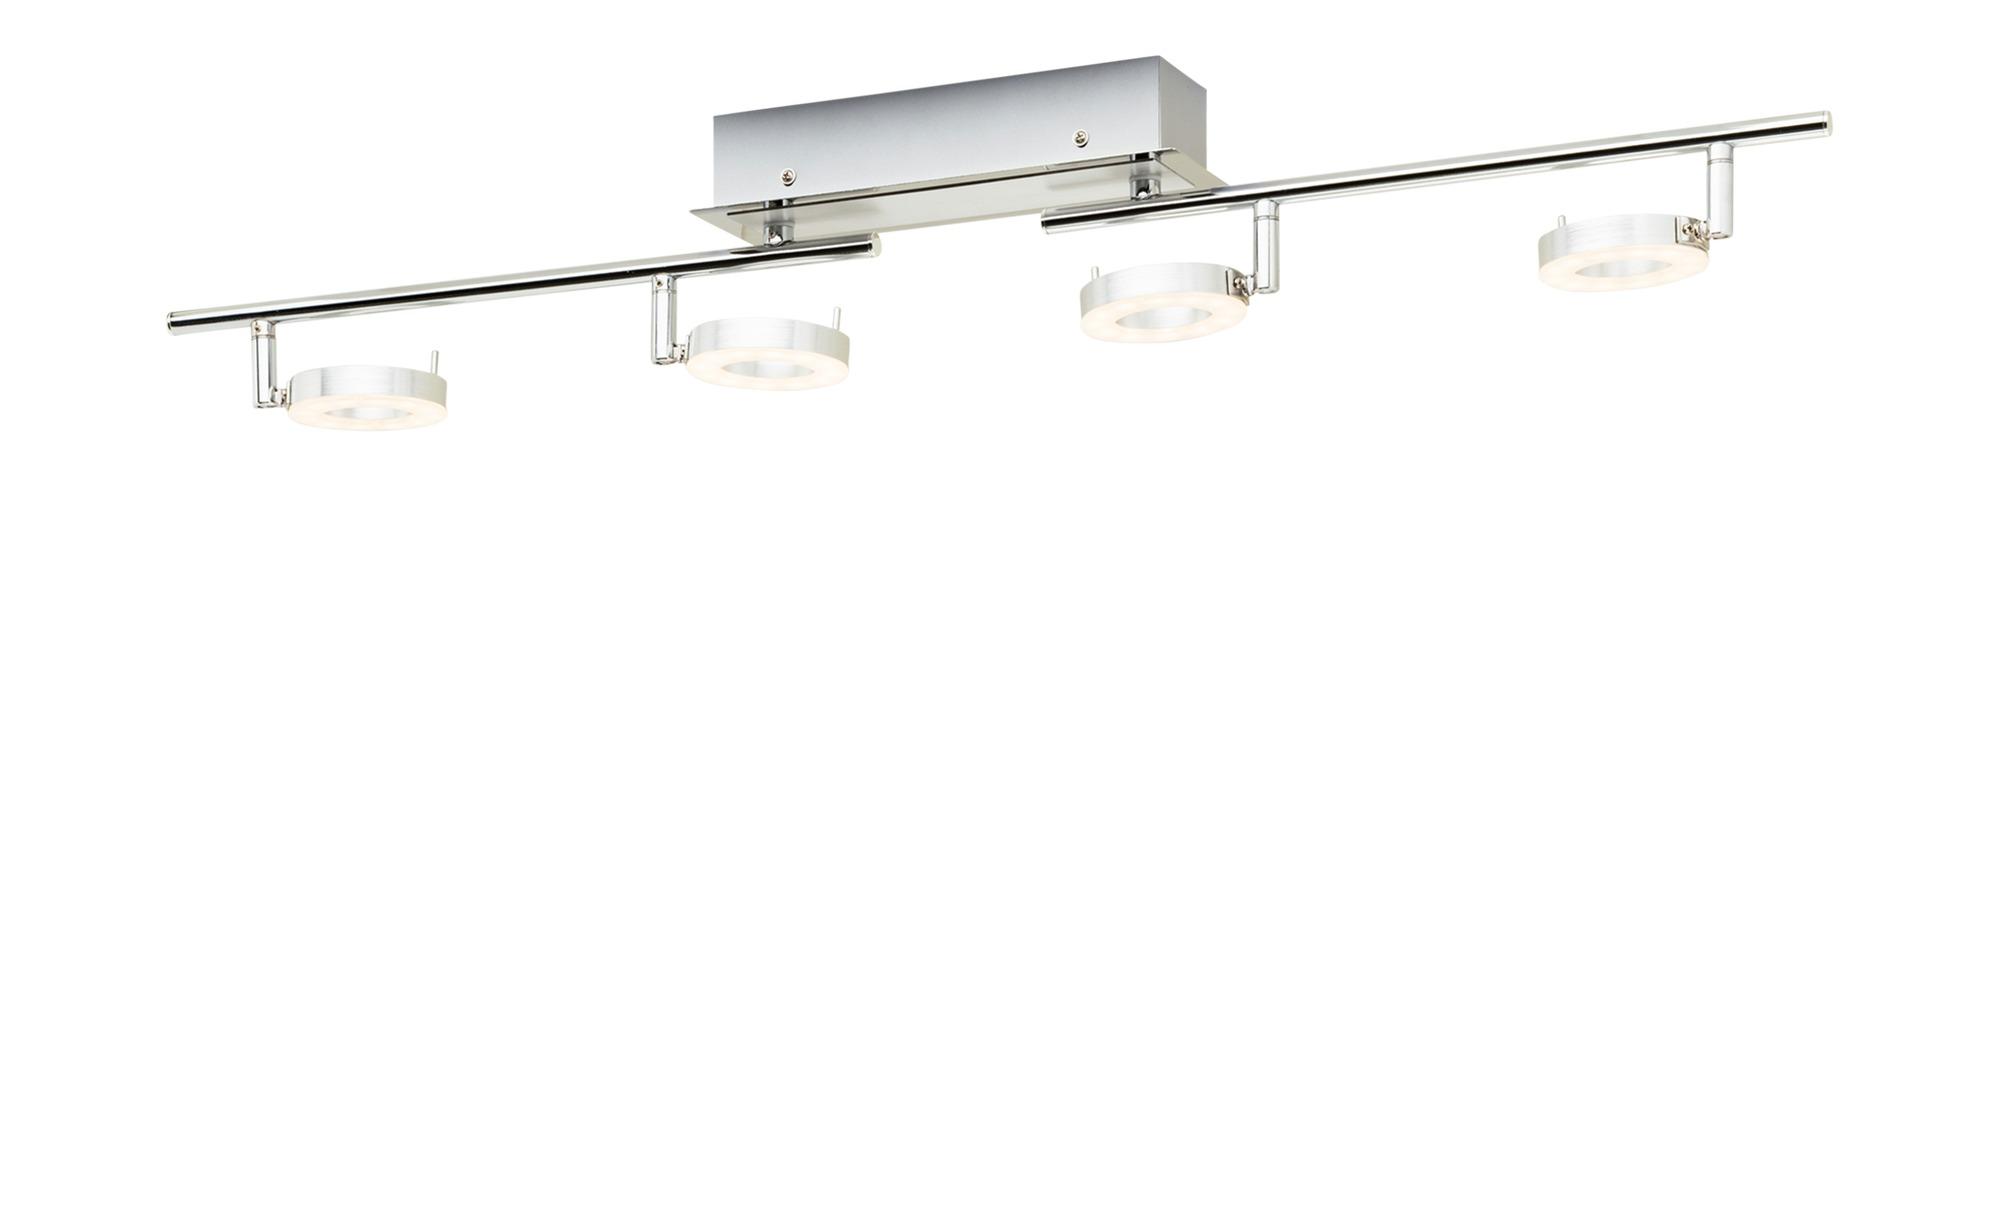 Paul Neuhaus LED-Deckenstrahler mit 4 ringförmigen Spots ¦ silber ¦ Maße (cm): B: 85,5 Lampen & Leuchten > LED-Leuchten > LED-Strahler & Spots - Höffner